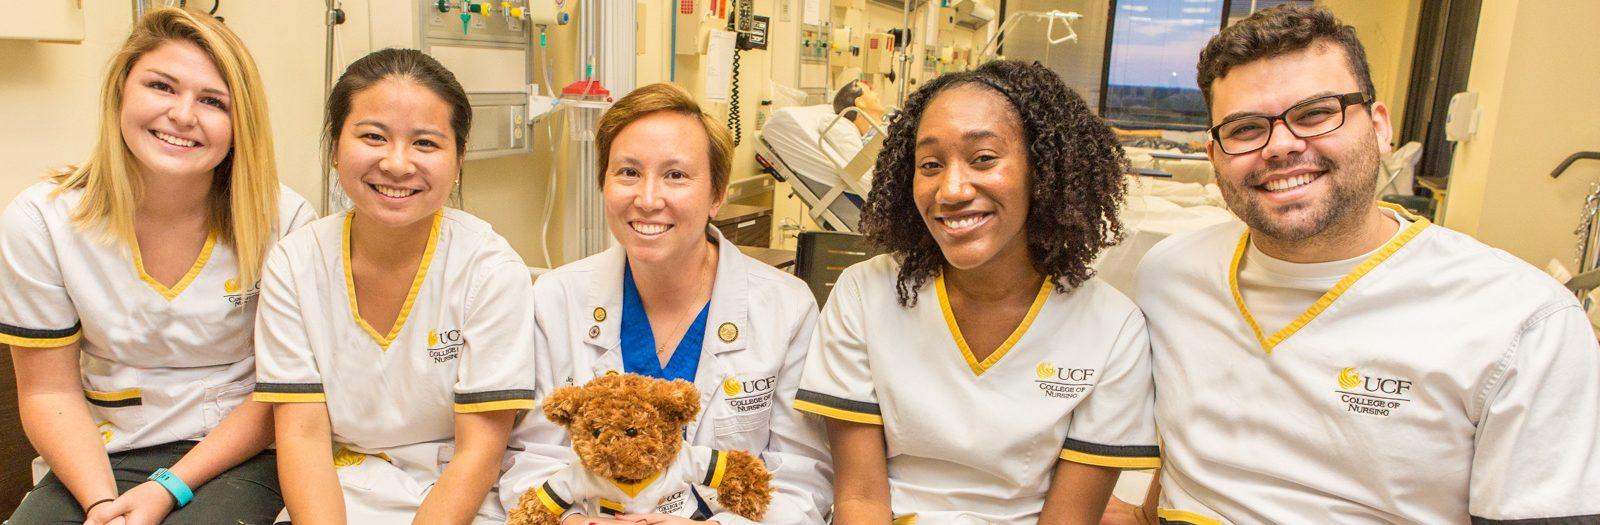 Ucf Nurse Spring 2020.Scholarships Aid Ucf College Of Nursing